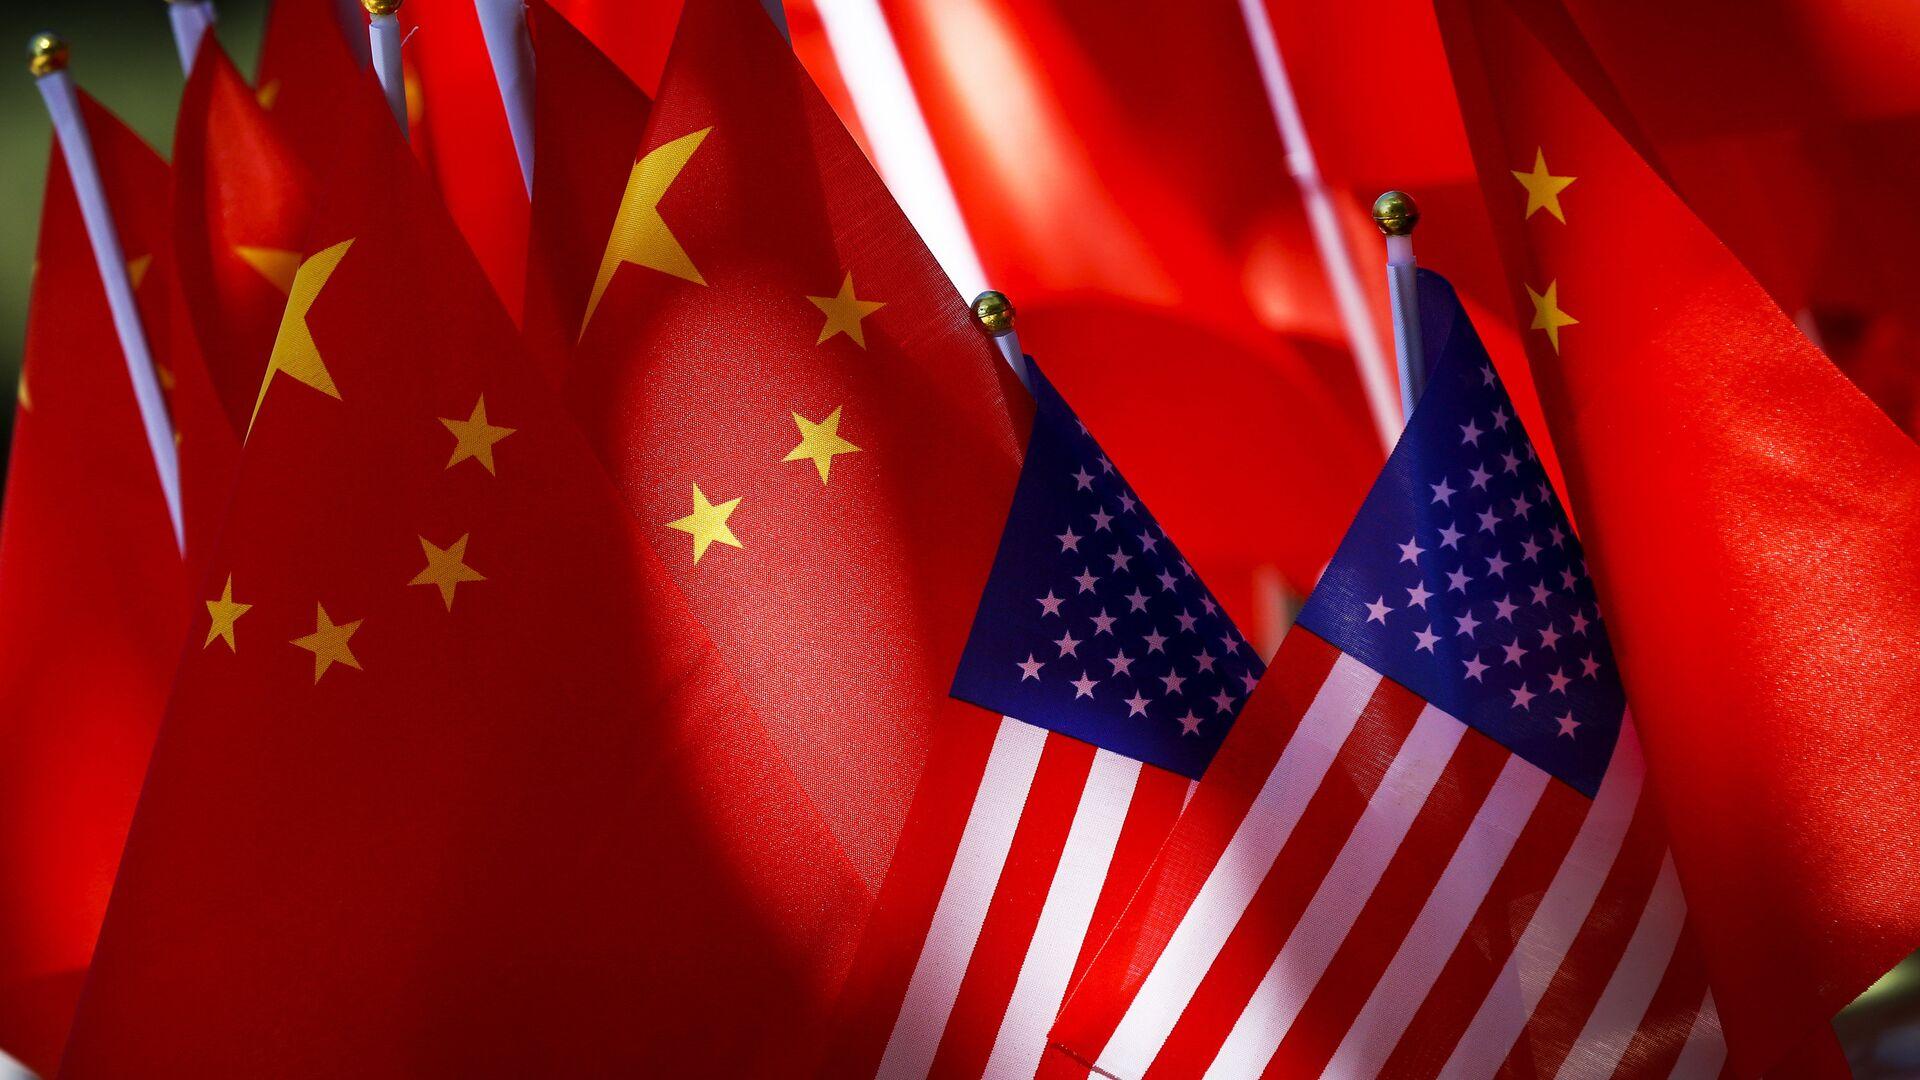 Флаги США и КНР на повозке велорикши в Пекине, Китай - РИА Новости, 1920, 10.08.2021